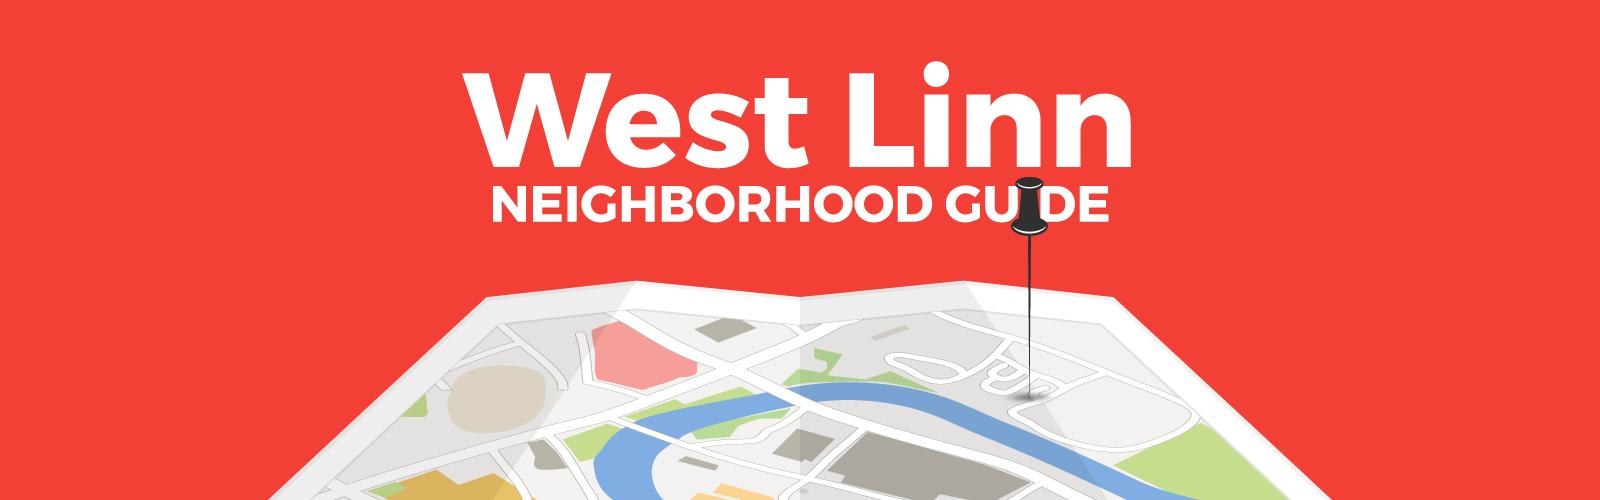 West Linn Oregon Neighborhood Guide